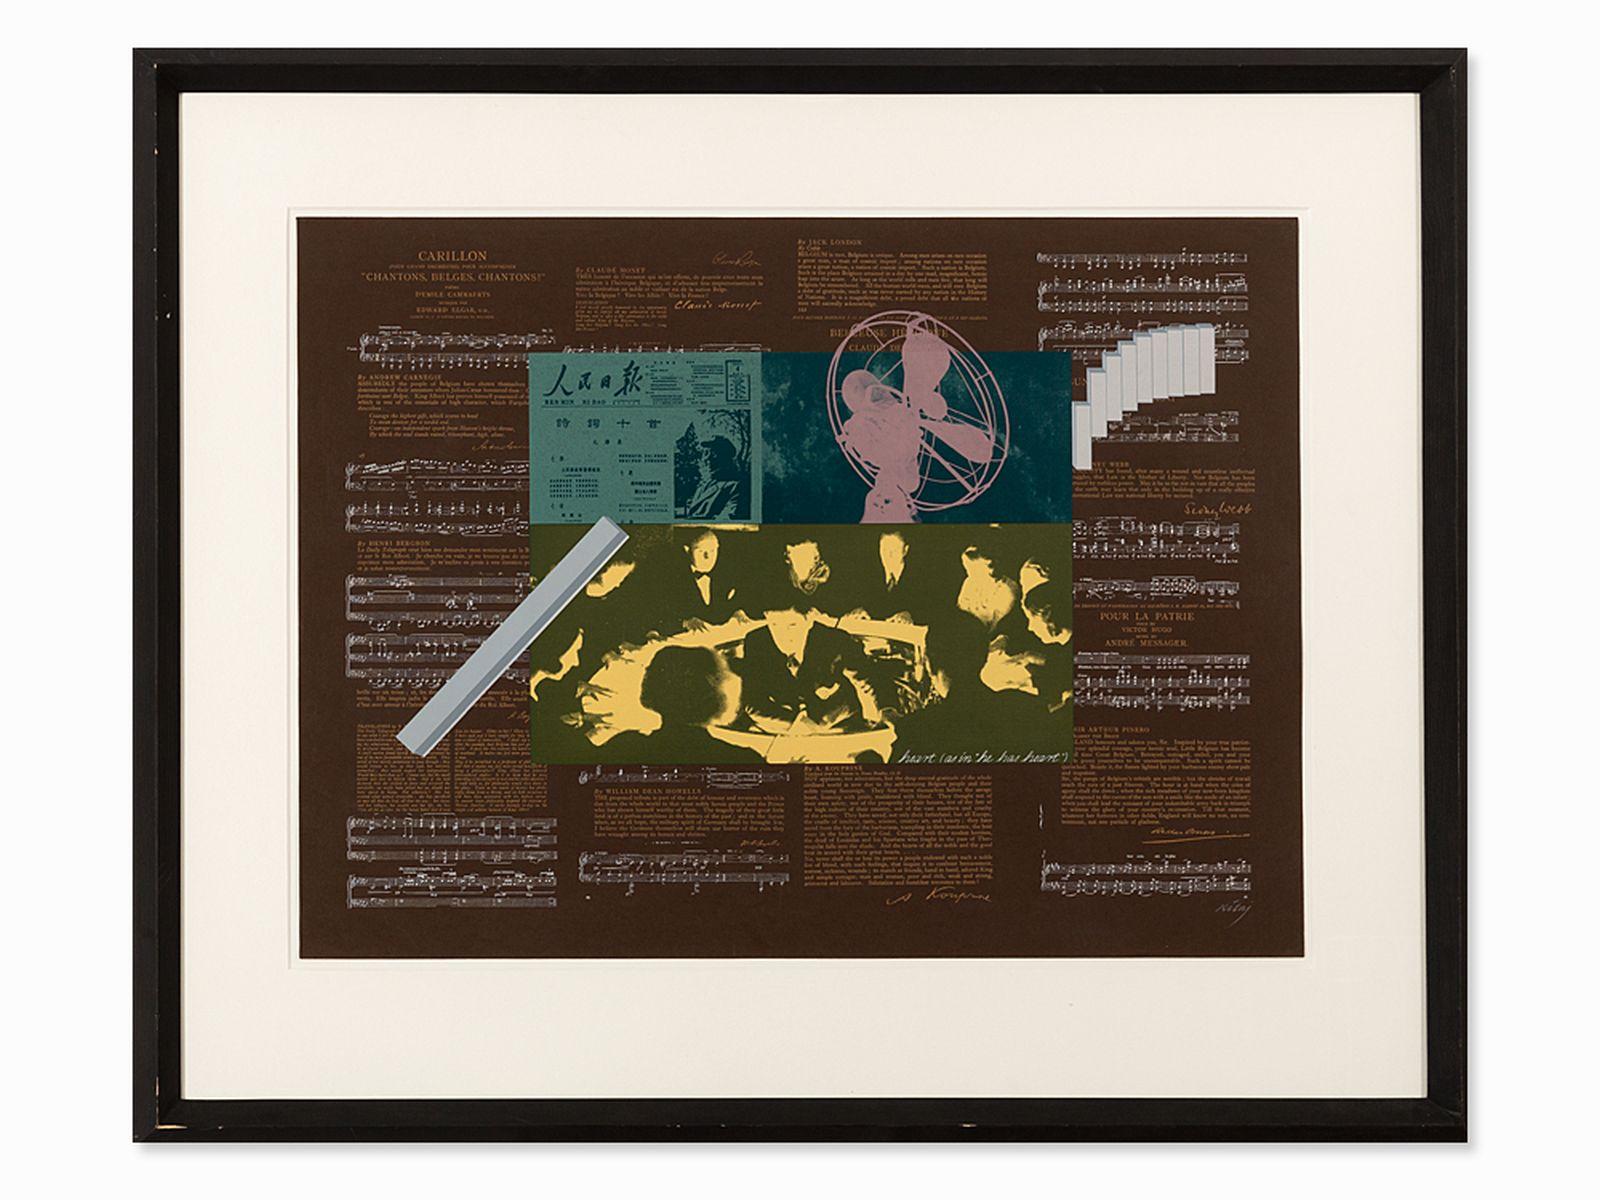 "#117 R.B. Kitaj (1887-1948) ""Heart"" 1966 | R.B. Kitaj (1887-1948) ""Heart"" 1966 Image"